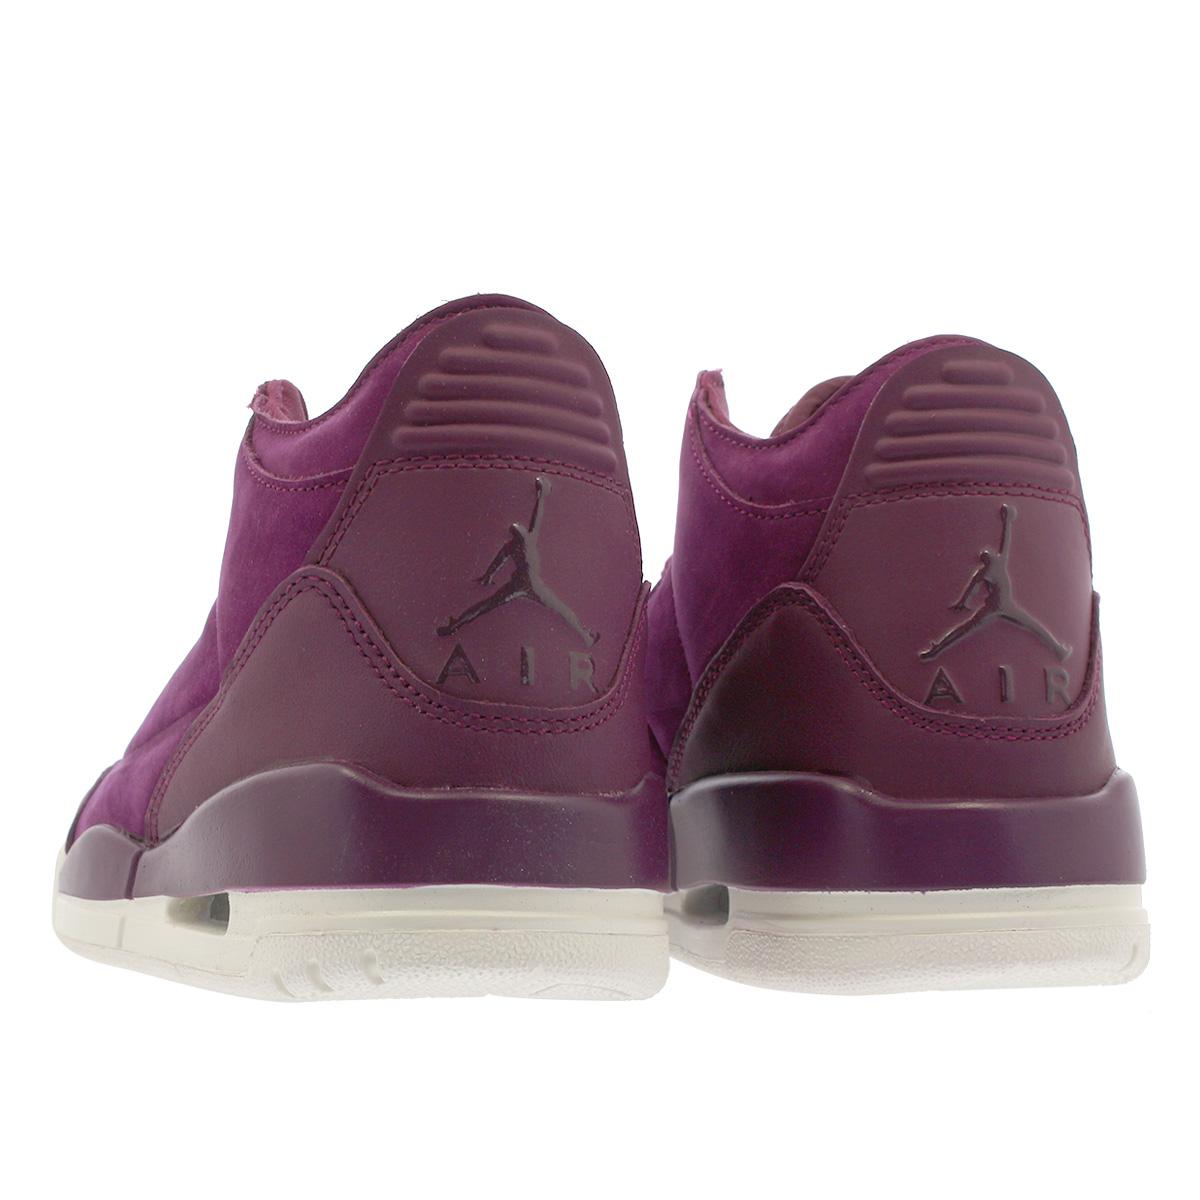 d7a6f616df3d NIKE WMNS AIR JORDAN 3 RETRO SE Nike women Air Jordan 3 nostalgic SE  BORDEAUX PHANTOM ah7859-600